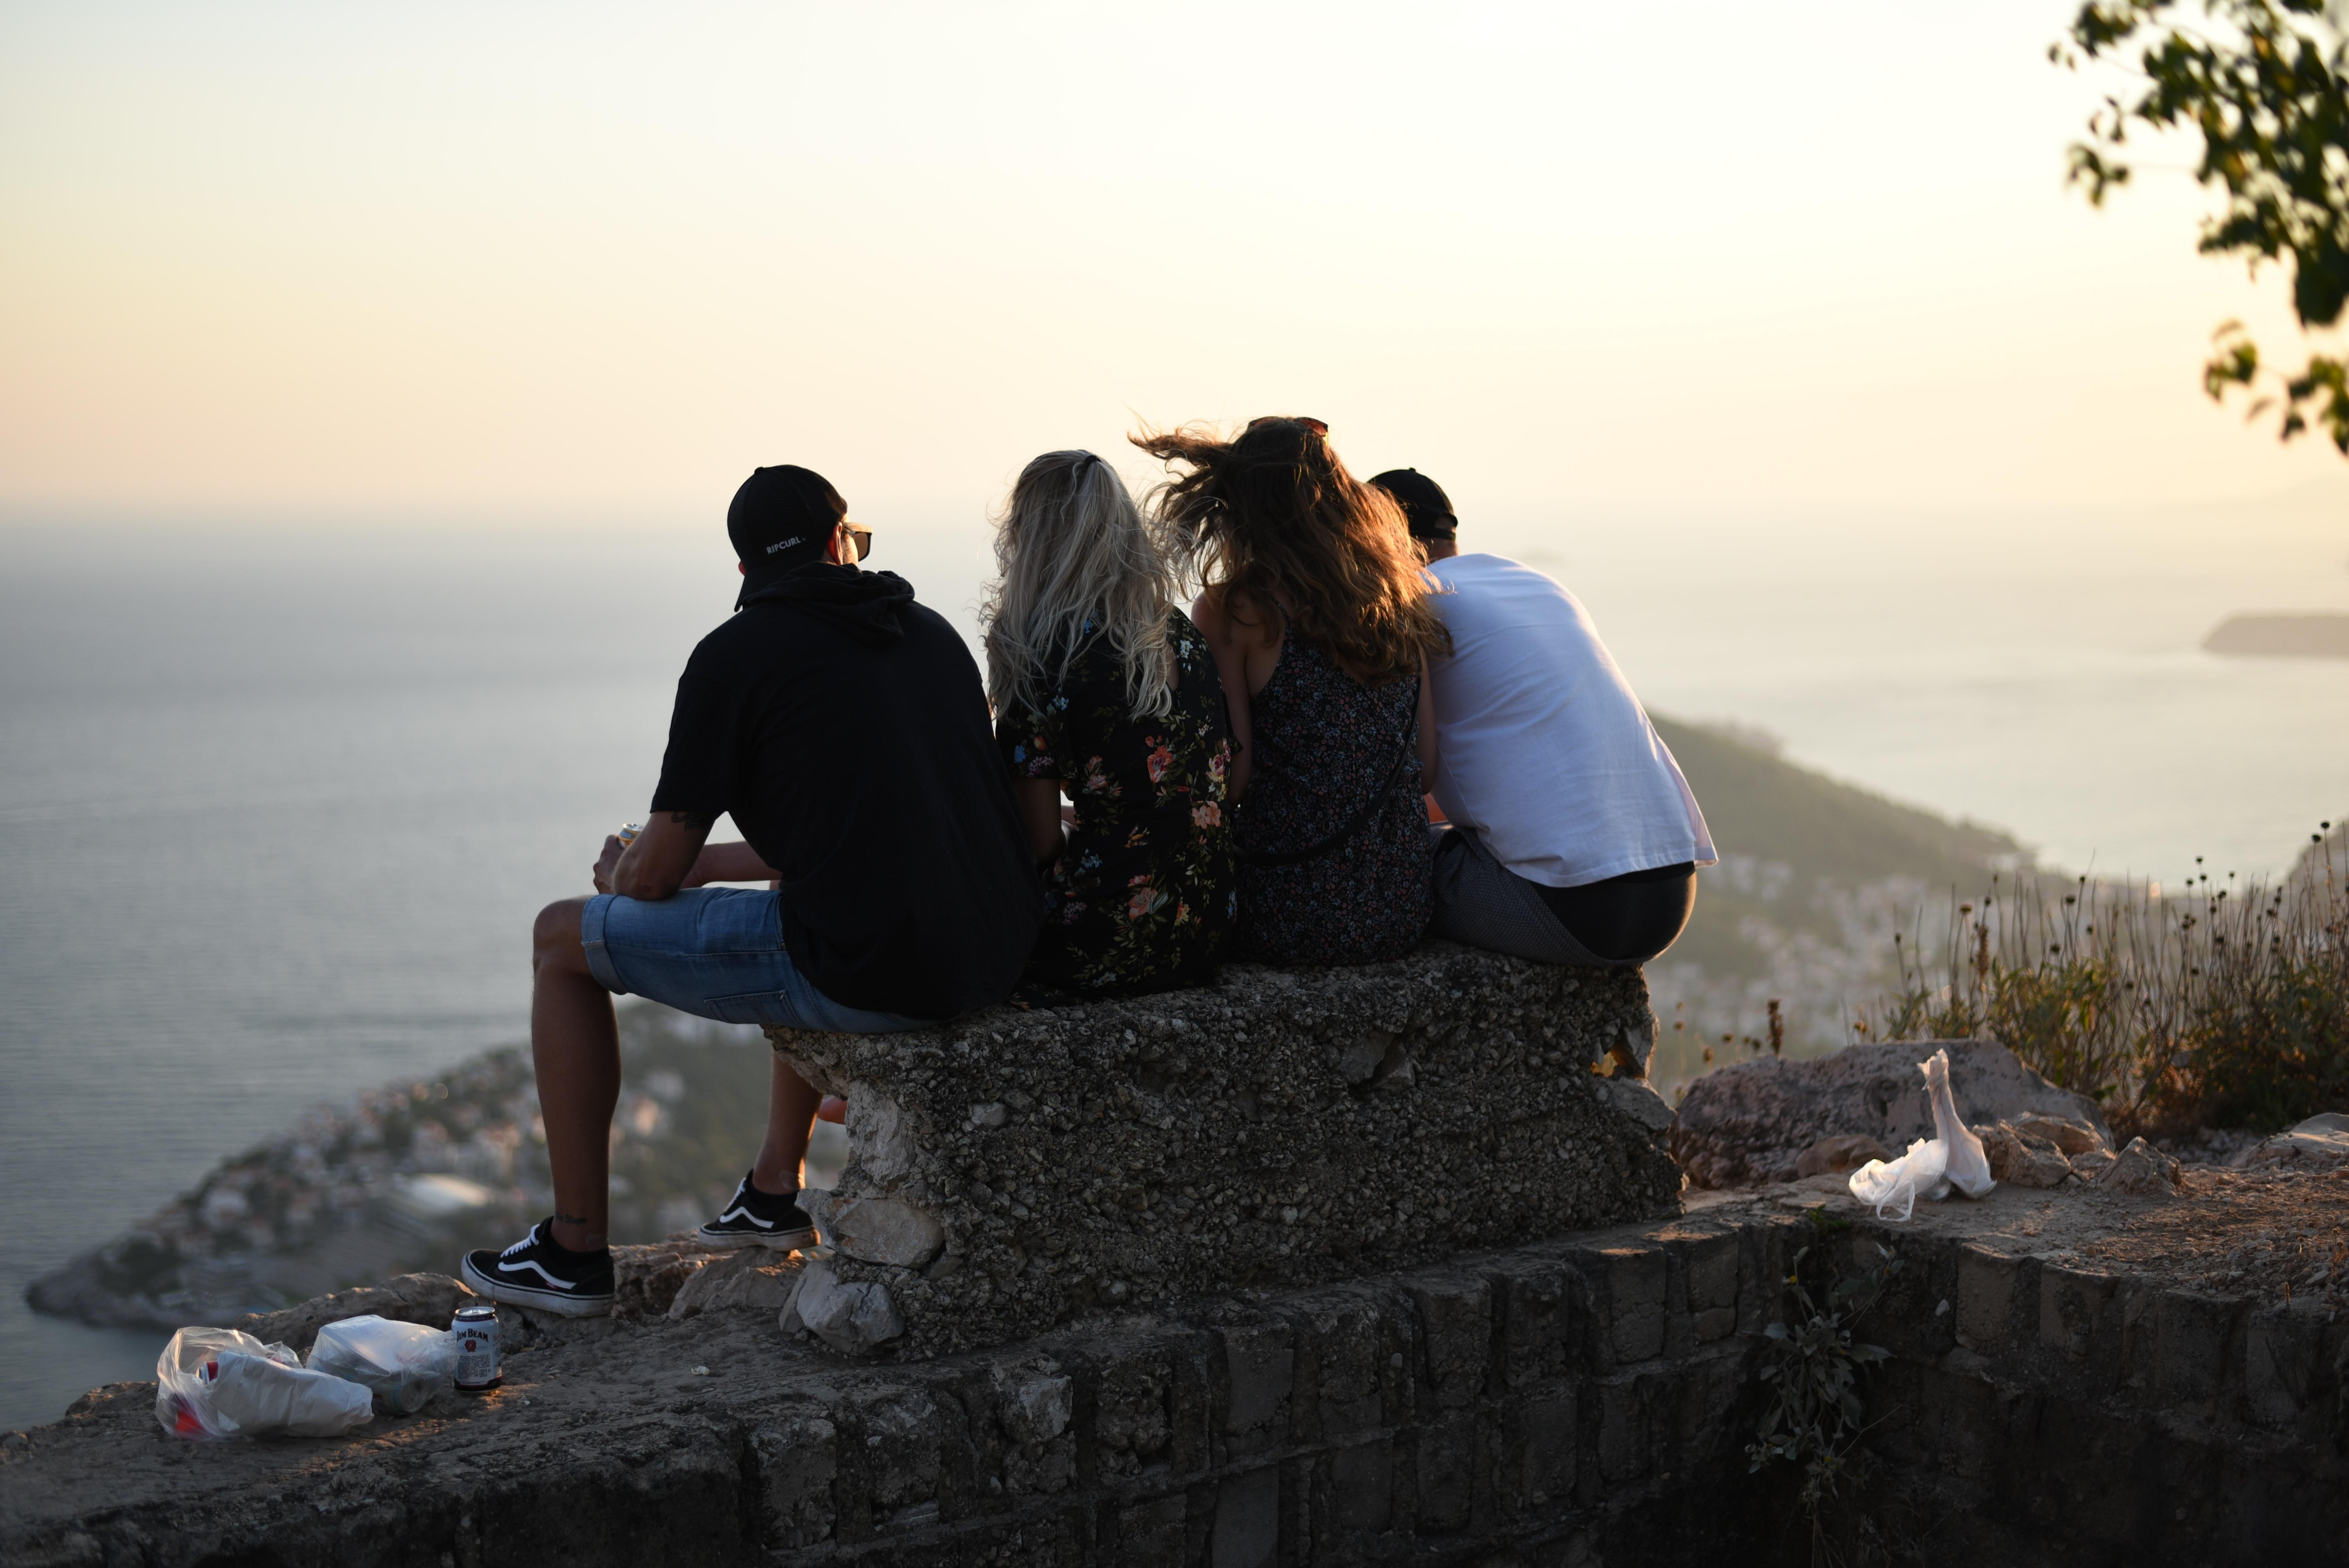 dating site- ul vom ie? i Intalnire cu femeia Maghrebian